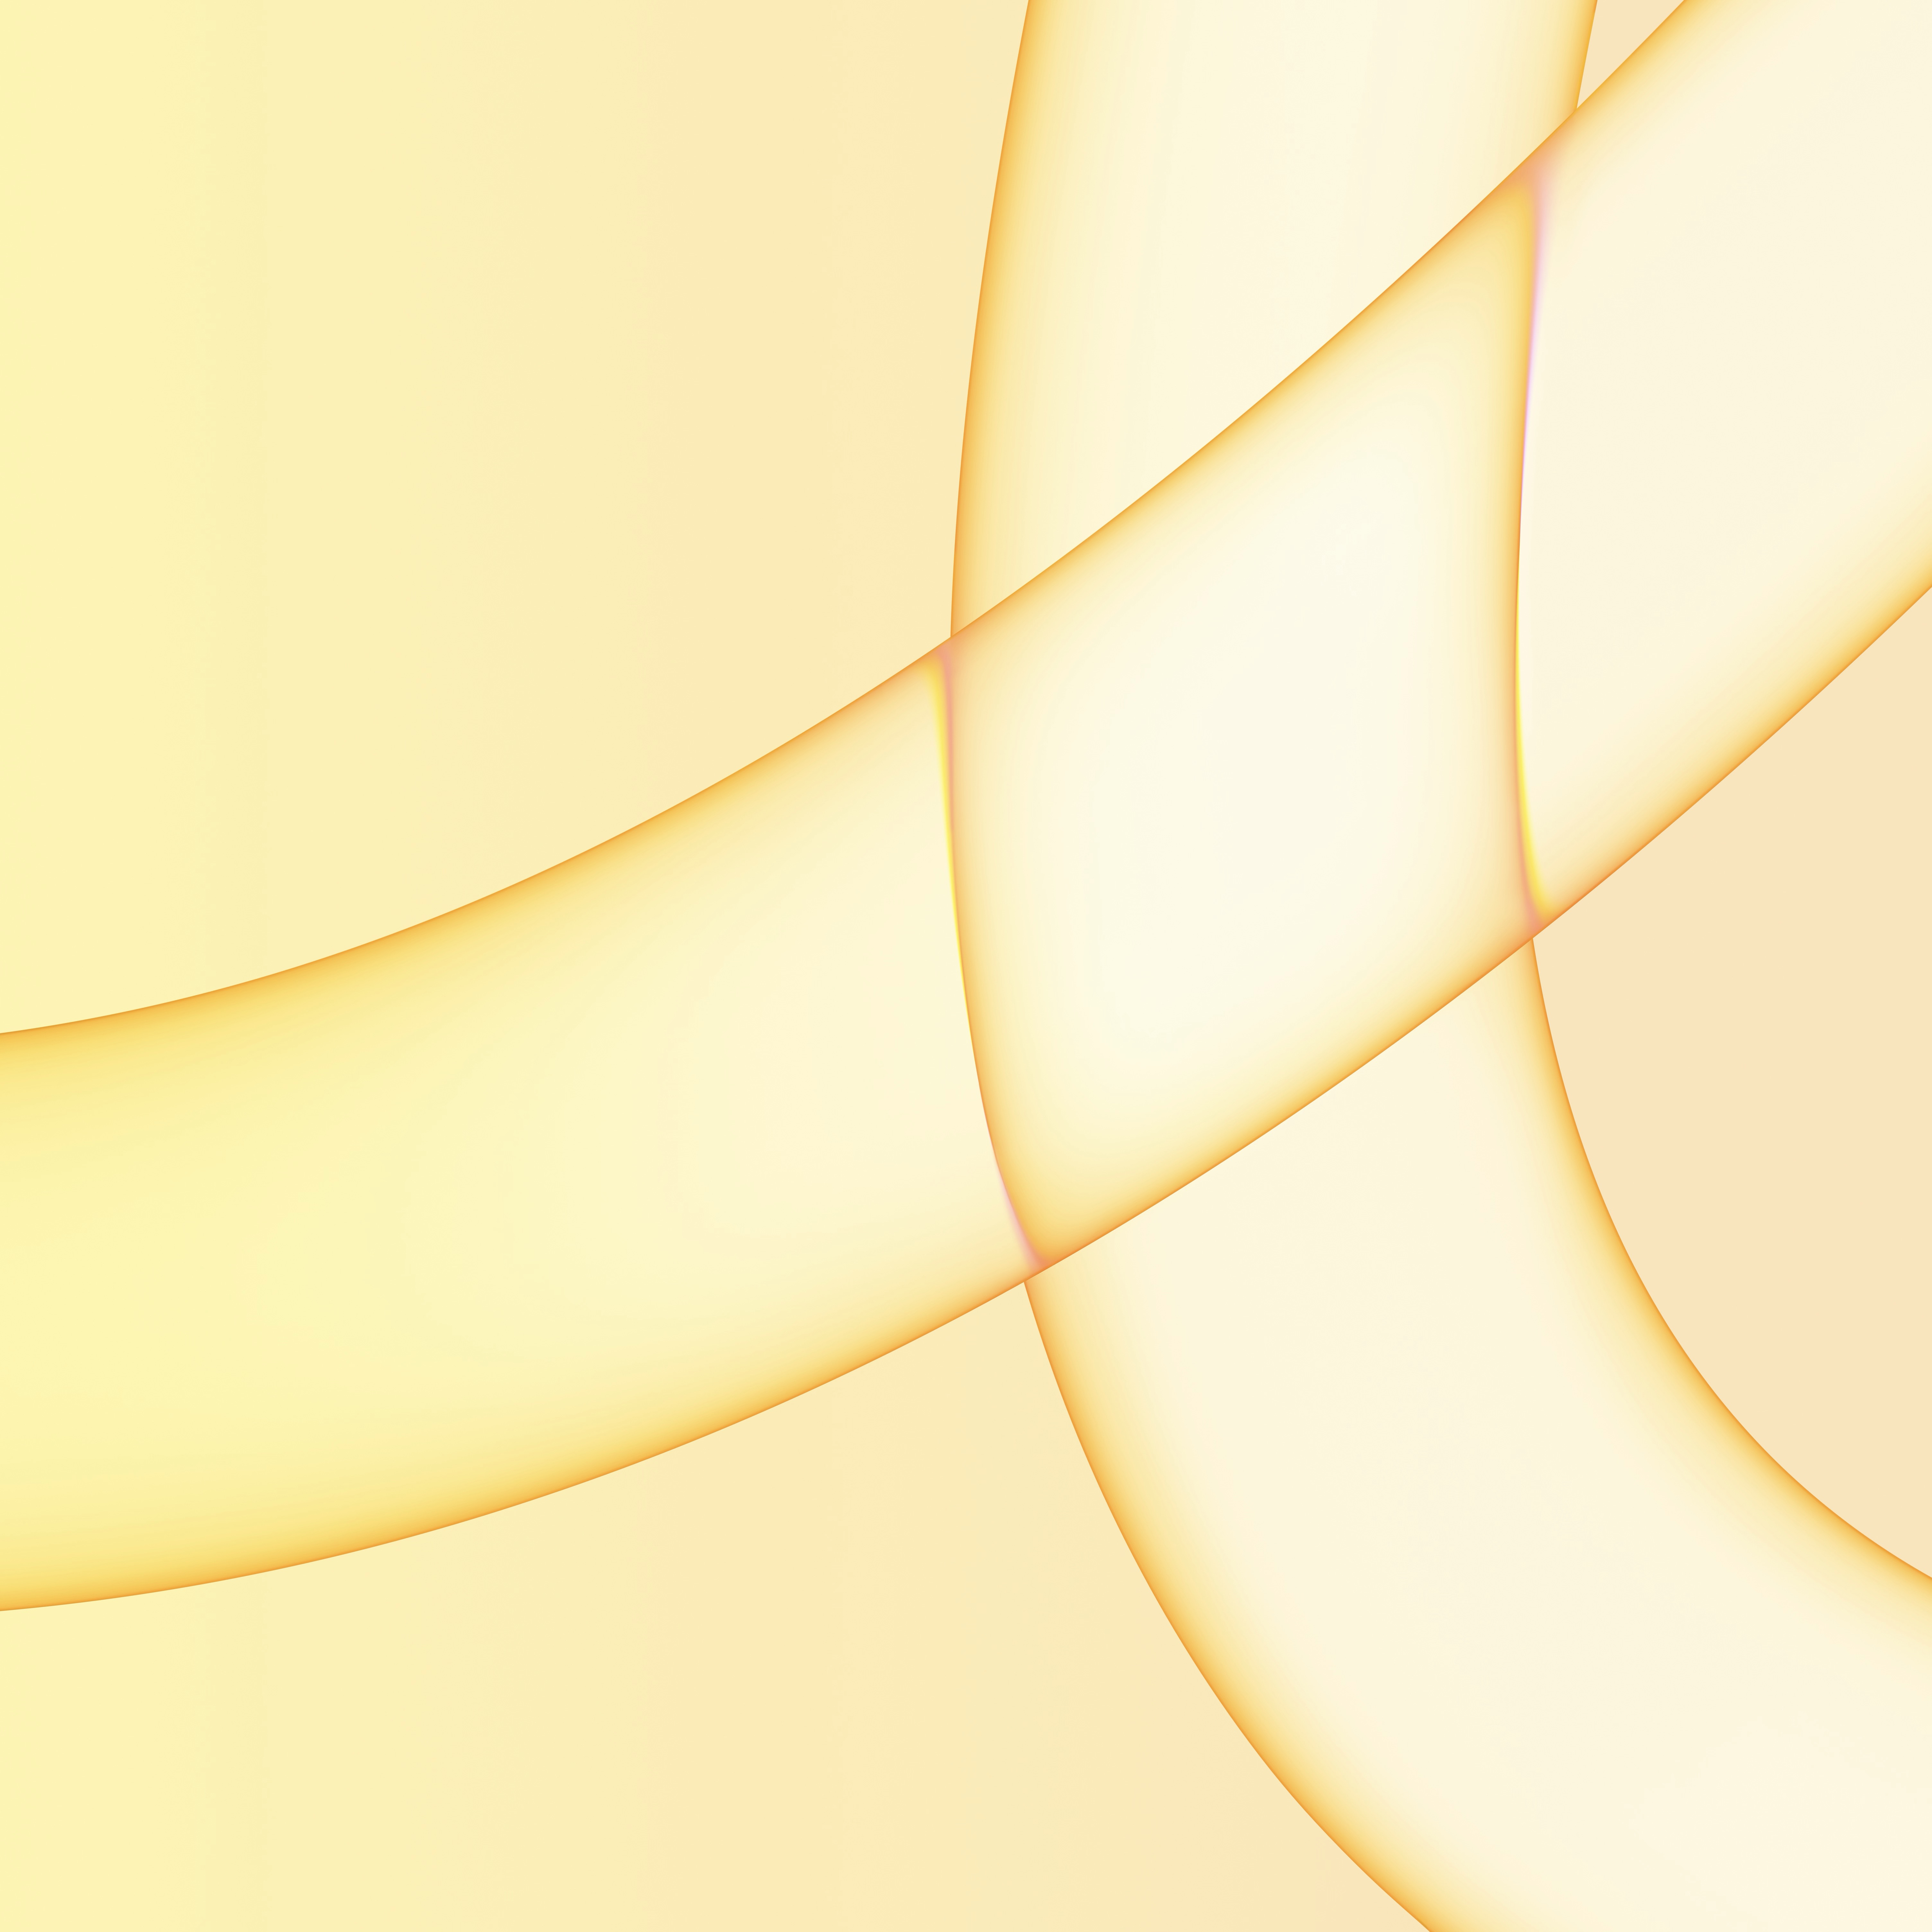 Bilder desktop sam.leonardjoel.com.au :